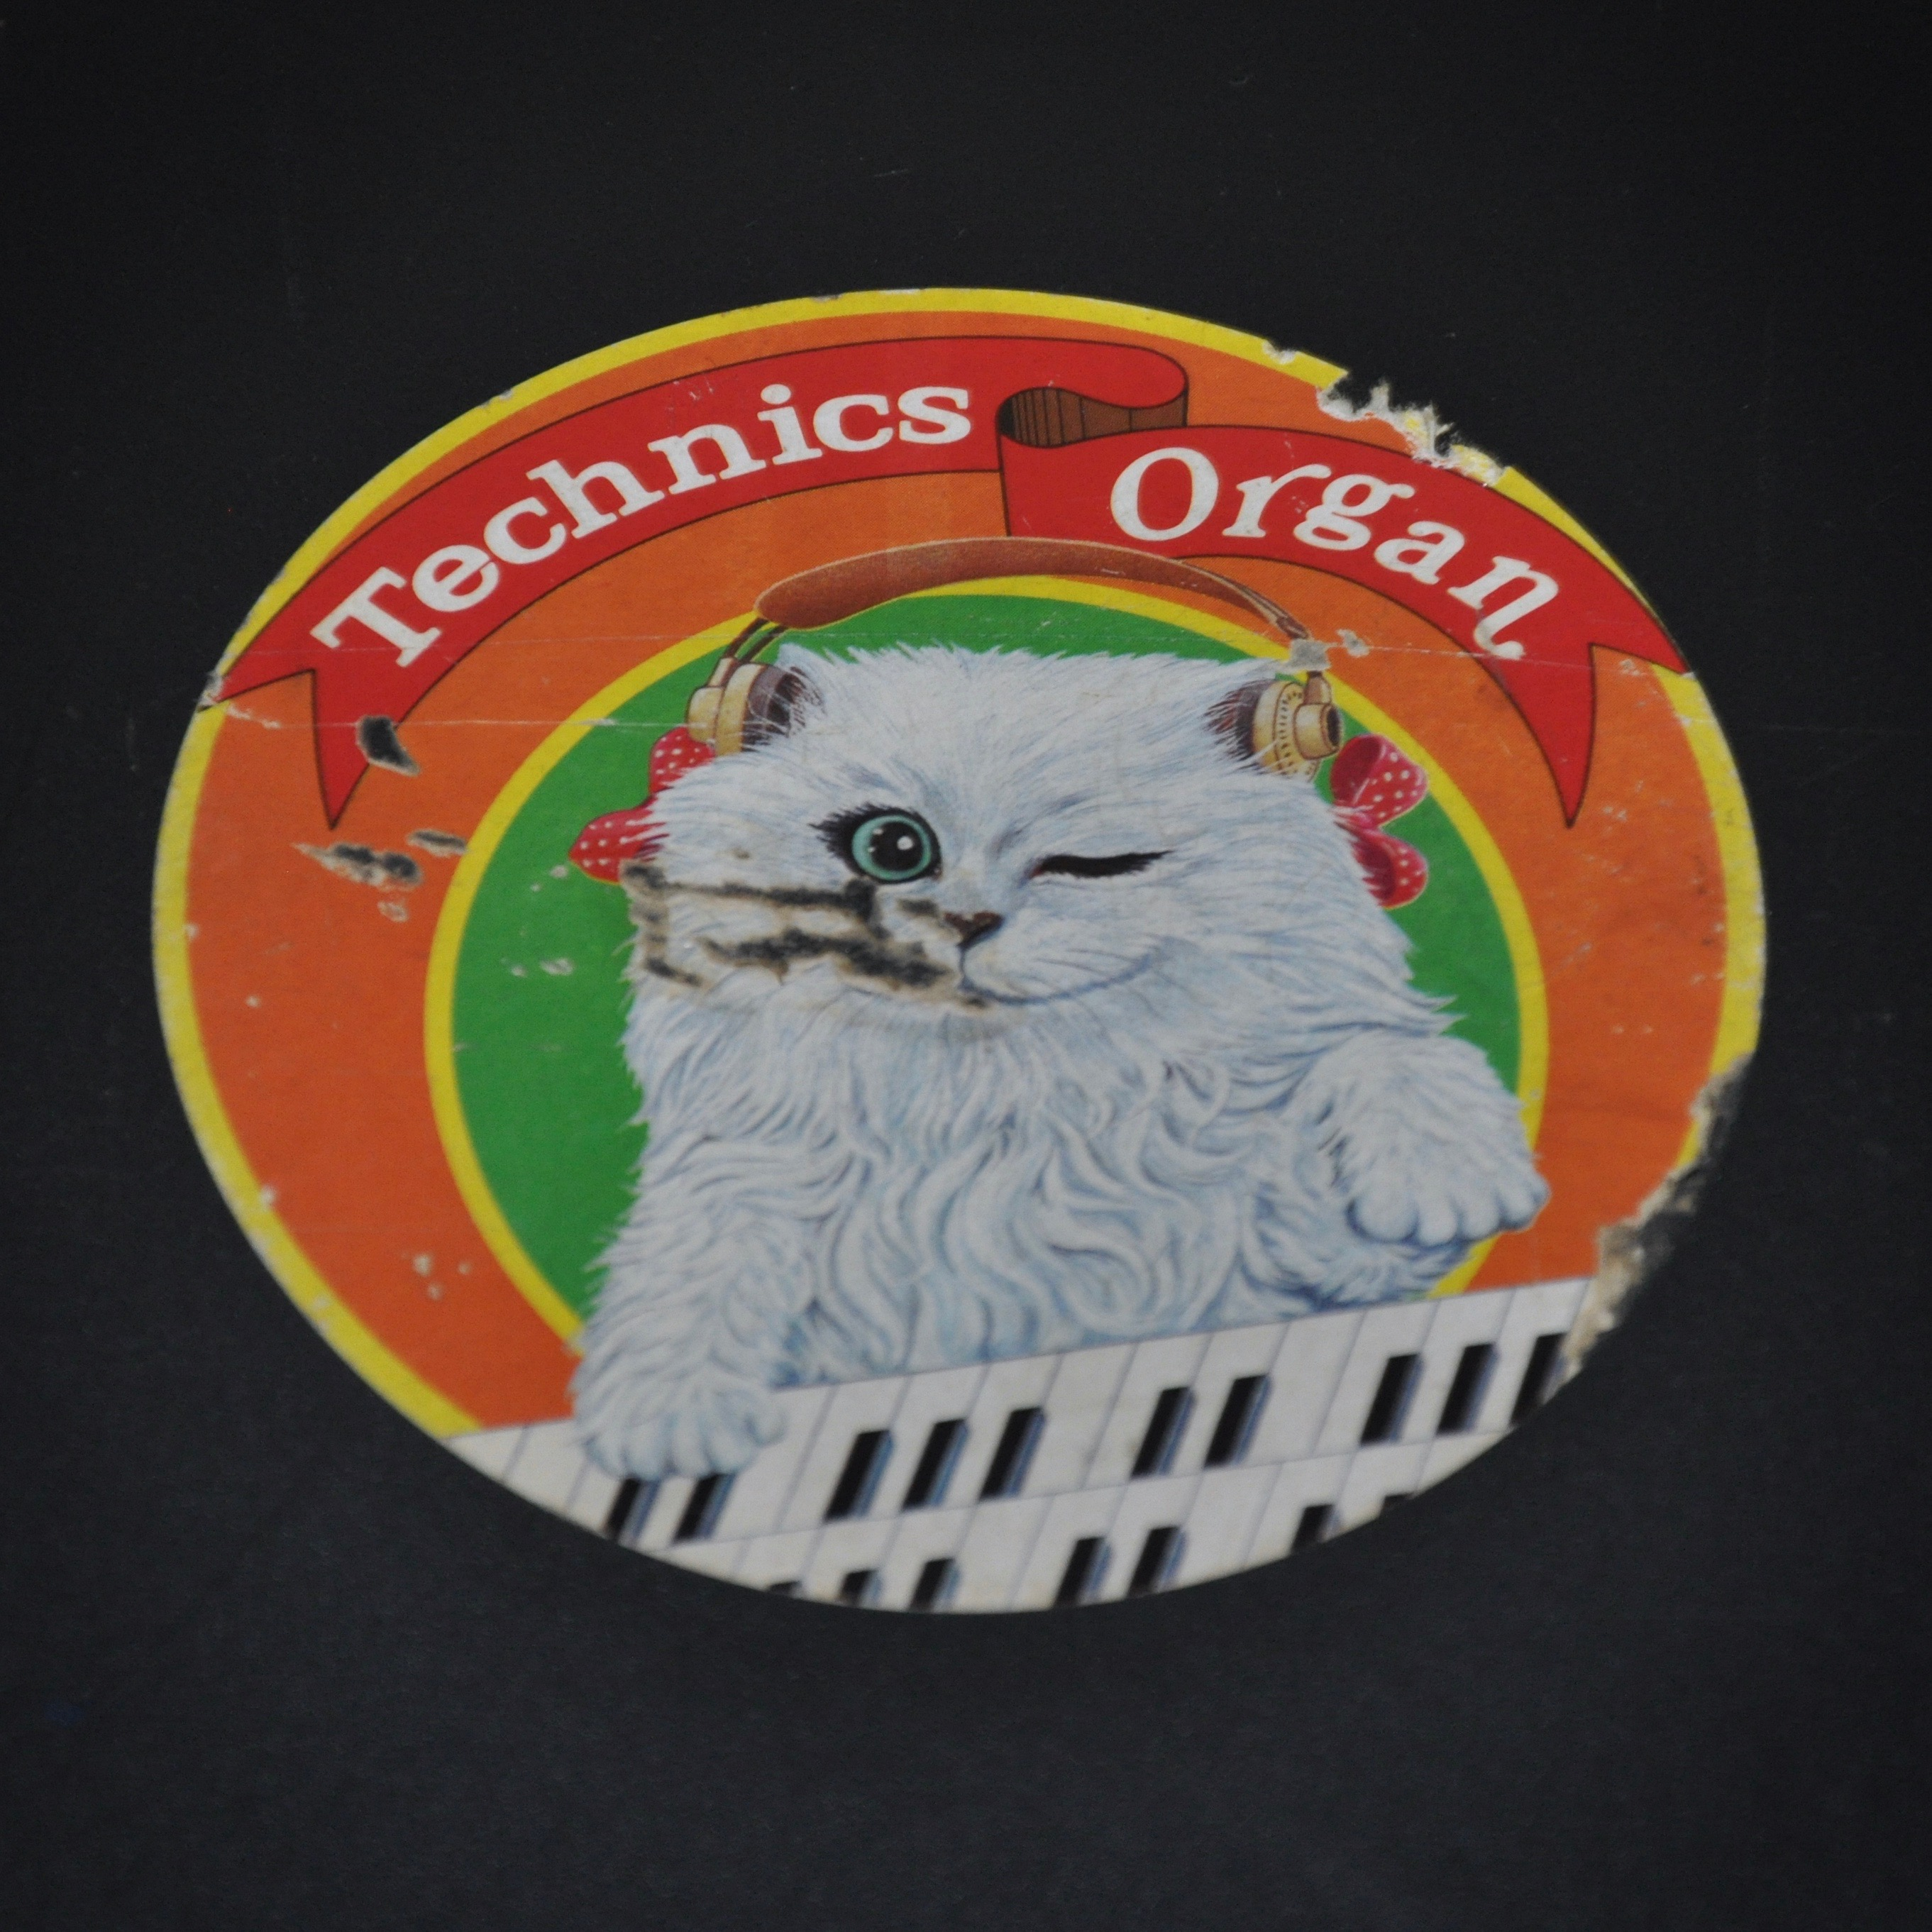 Vintage sticker op beschermkap typemachine Technics Organs